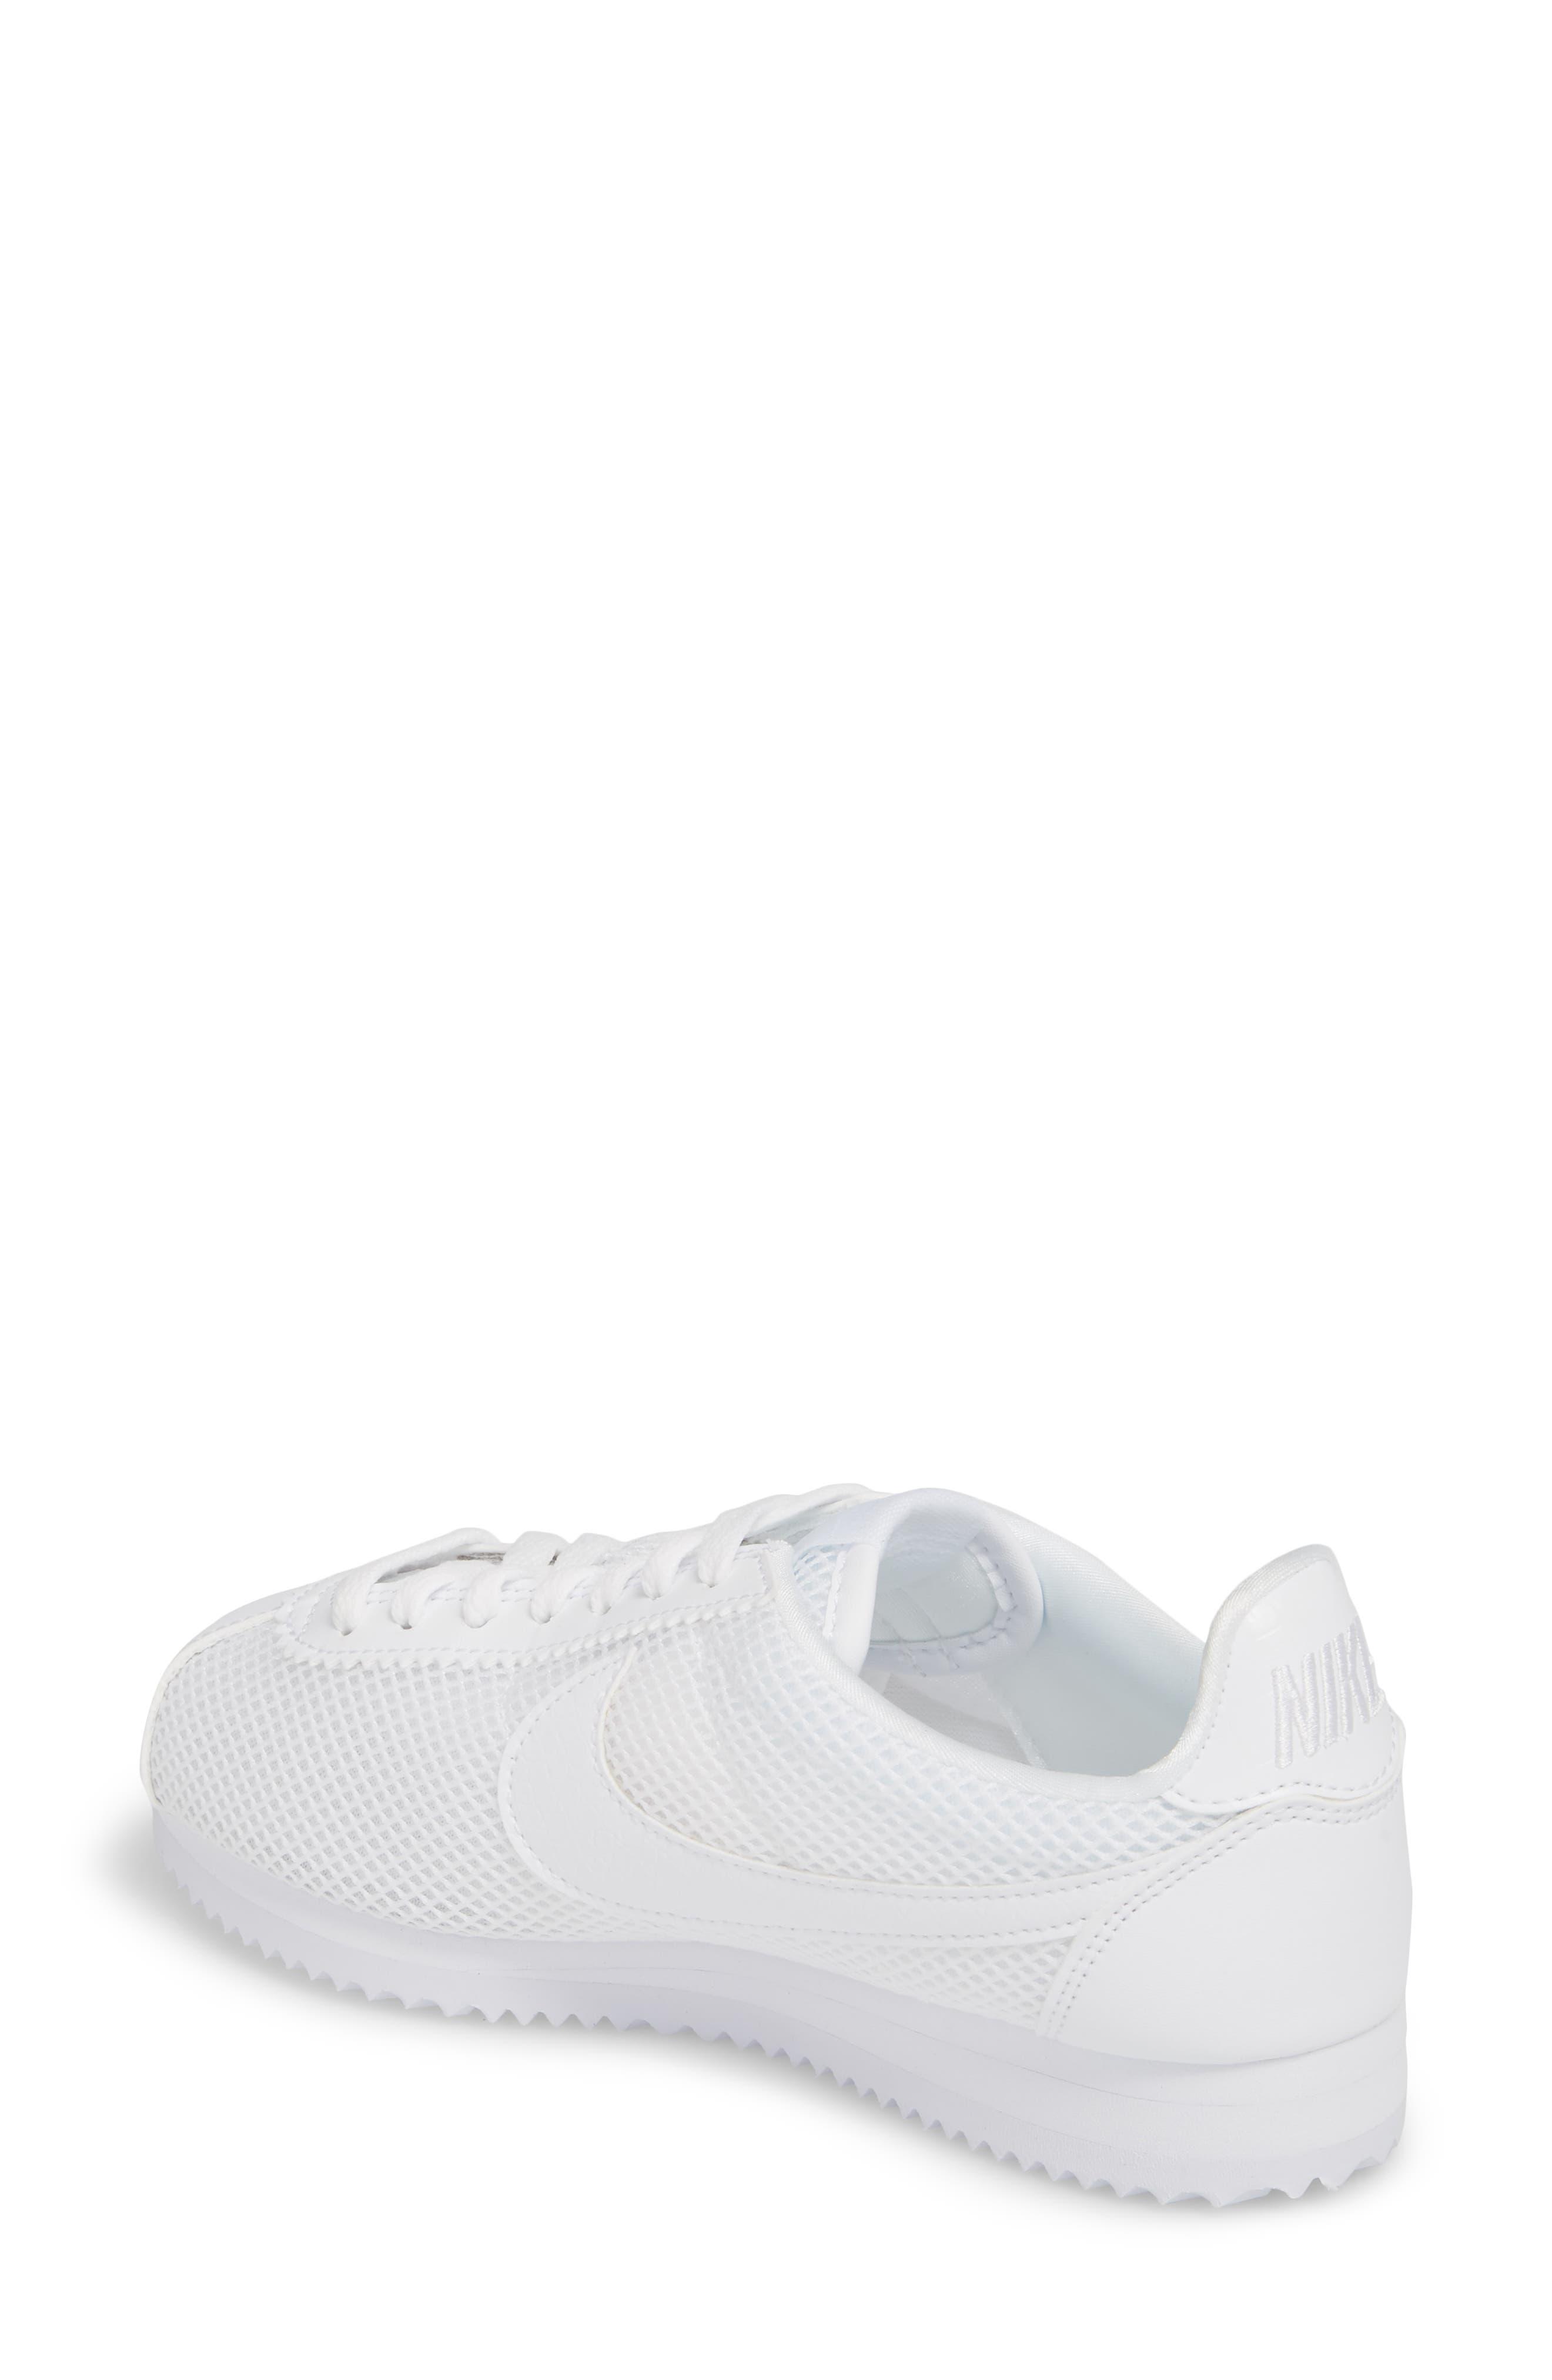 Classic Cortez Premium XLV Sneaker,                             Alternate thumbnail 2, color,                             White/ White